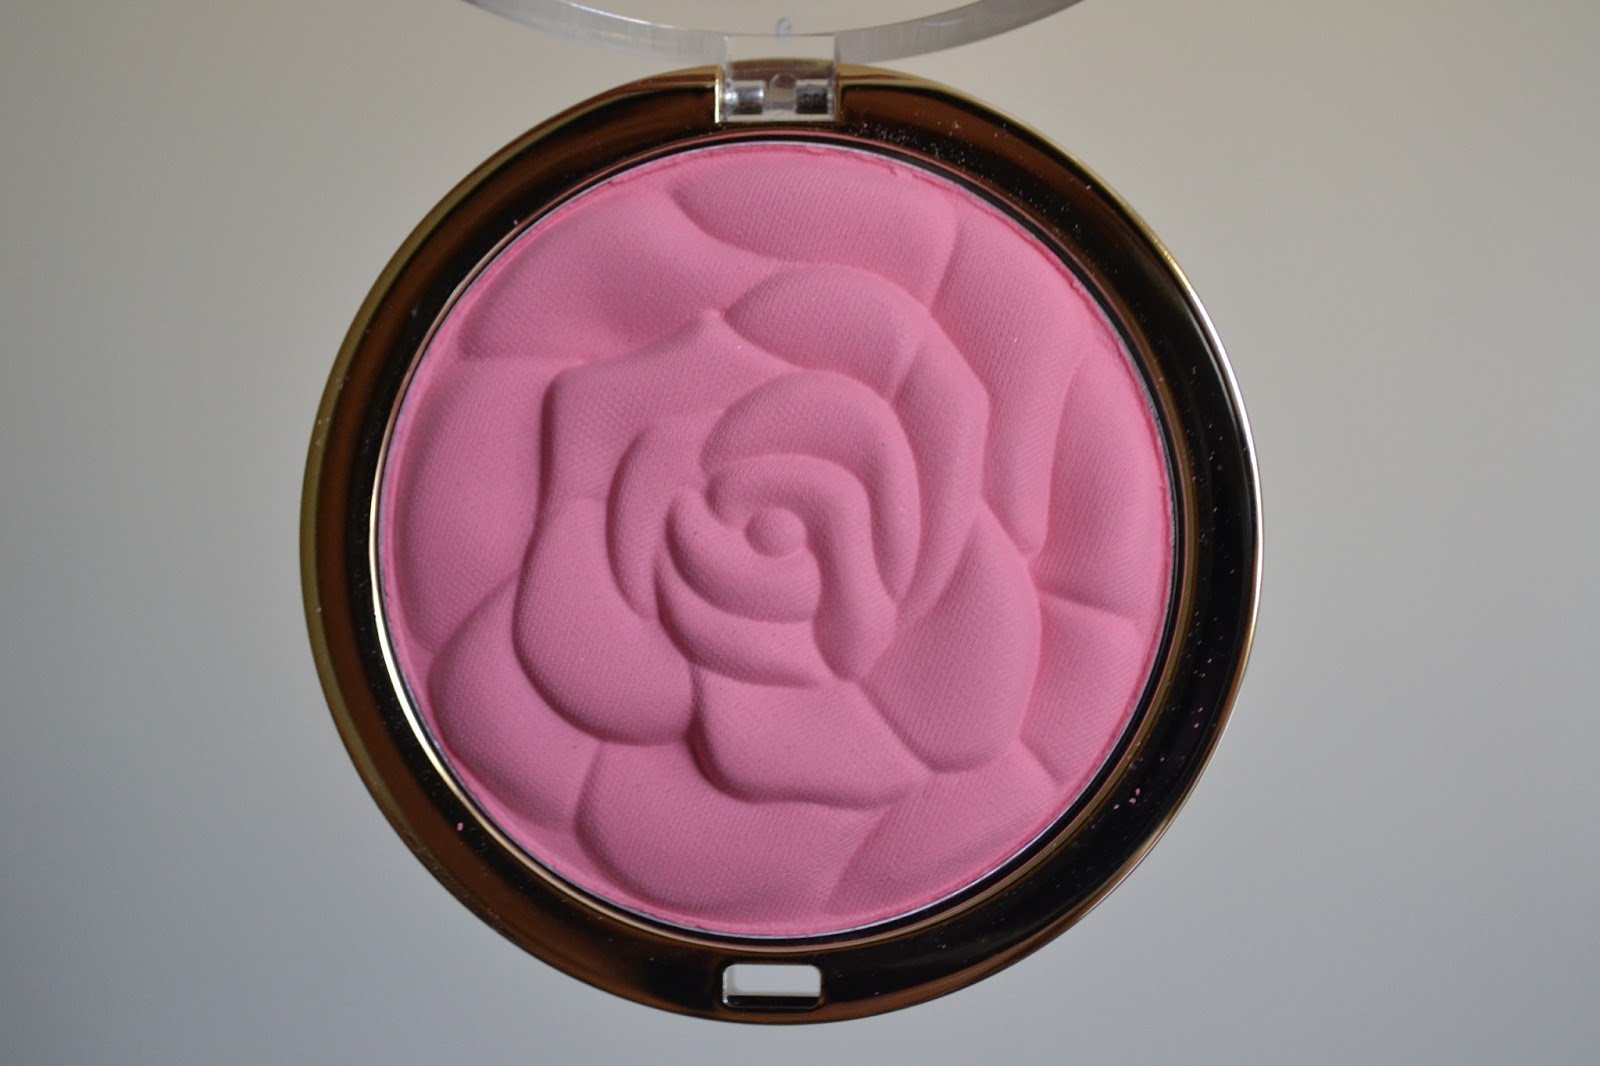 Aquaheart: Milani Cosmetics Coming Up Roses Powder Blush ...